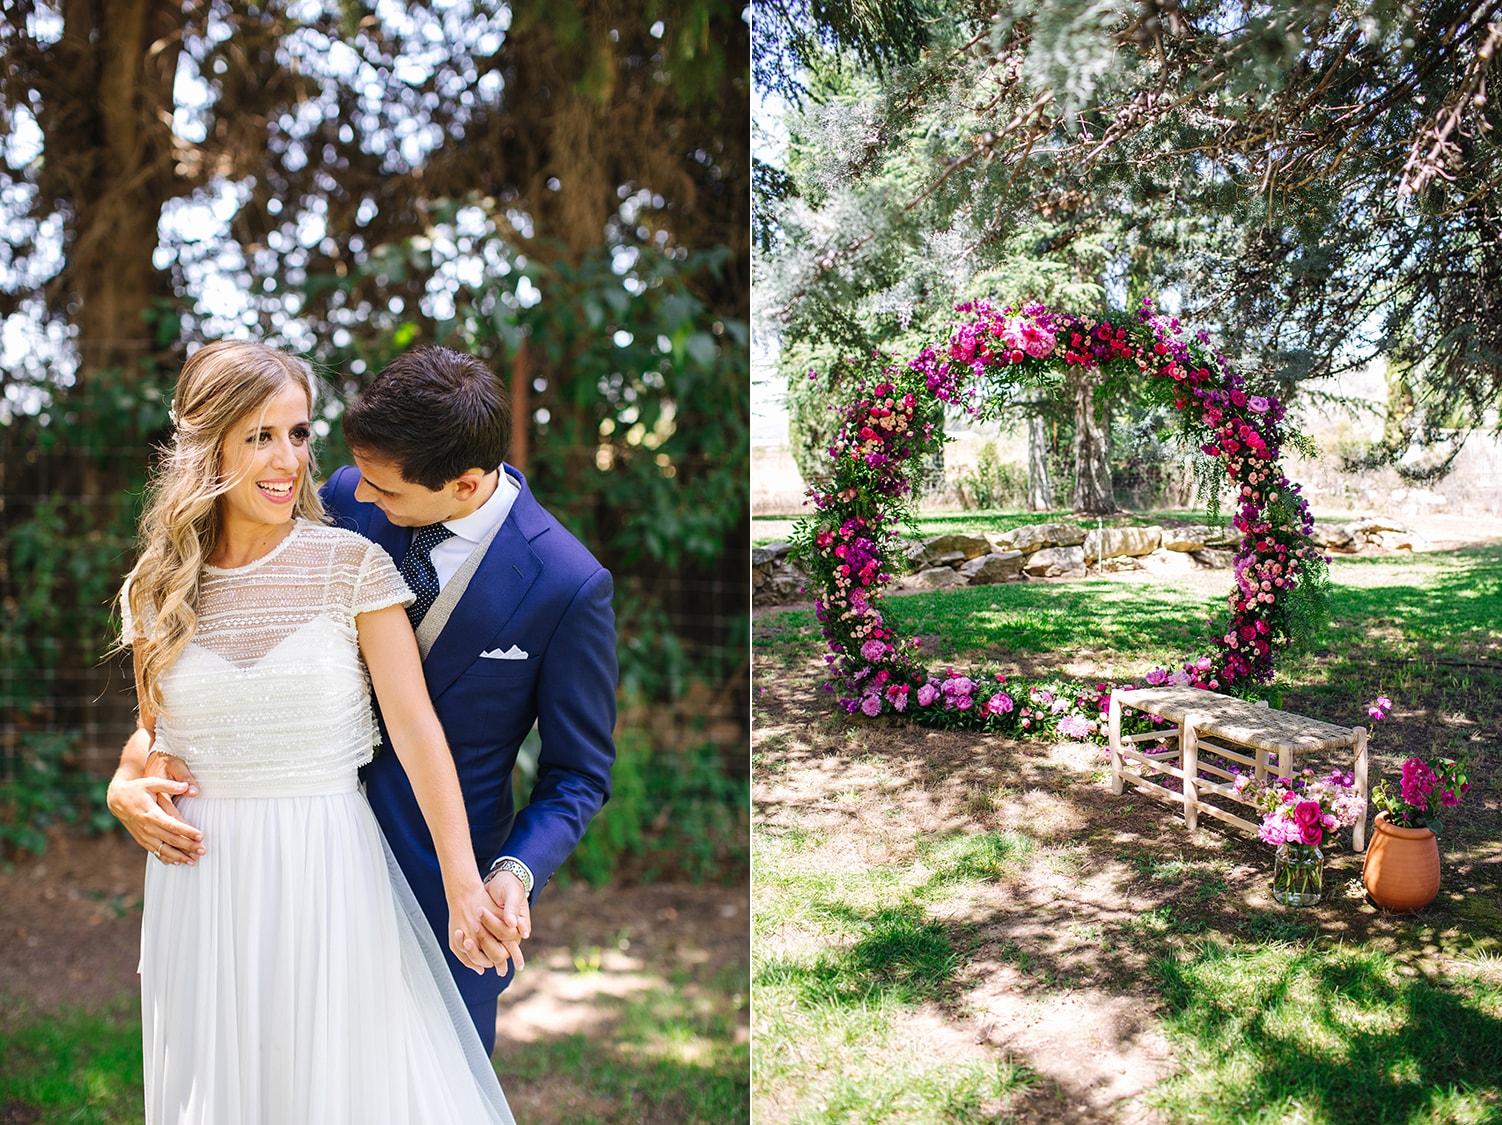 paulagfurio_bouganvillea_wedding_spain_004.jpg